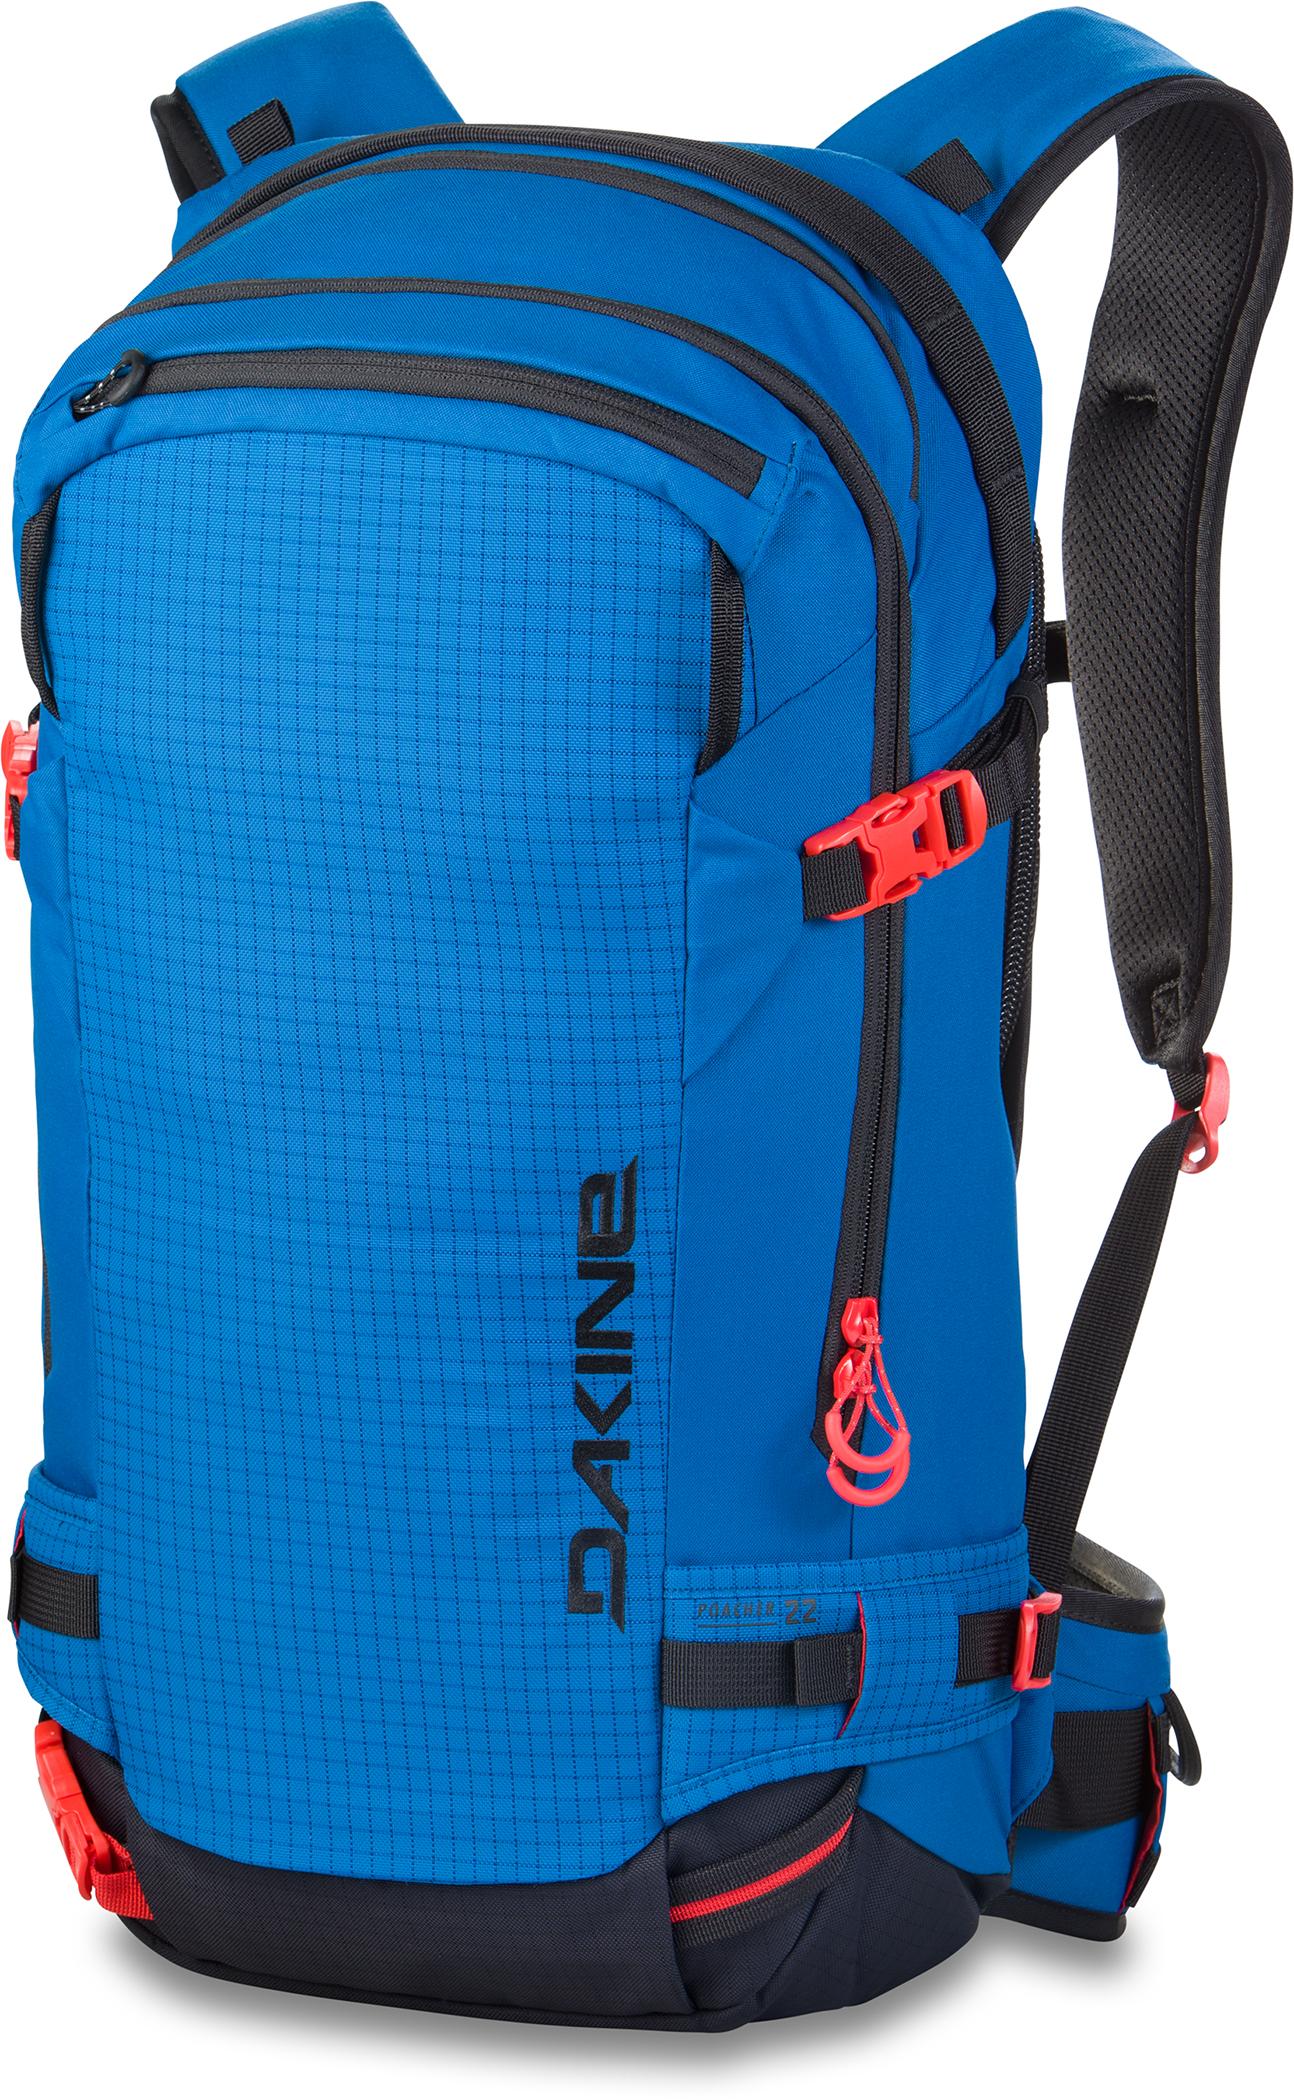 Dakine Poacher 22L Backpack 10002066-SCOUT-91M-OS w  Free S H e1dc449966122